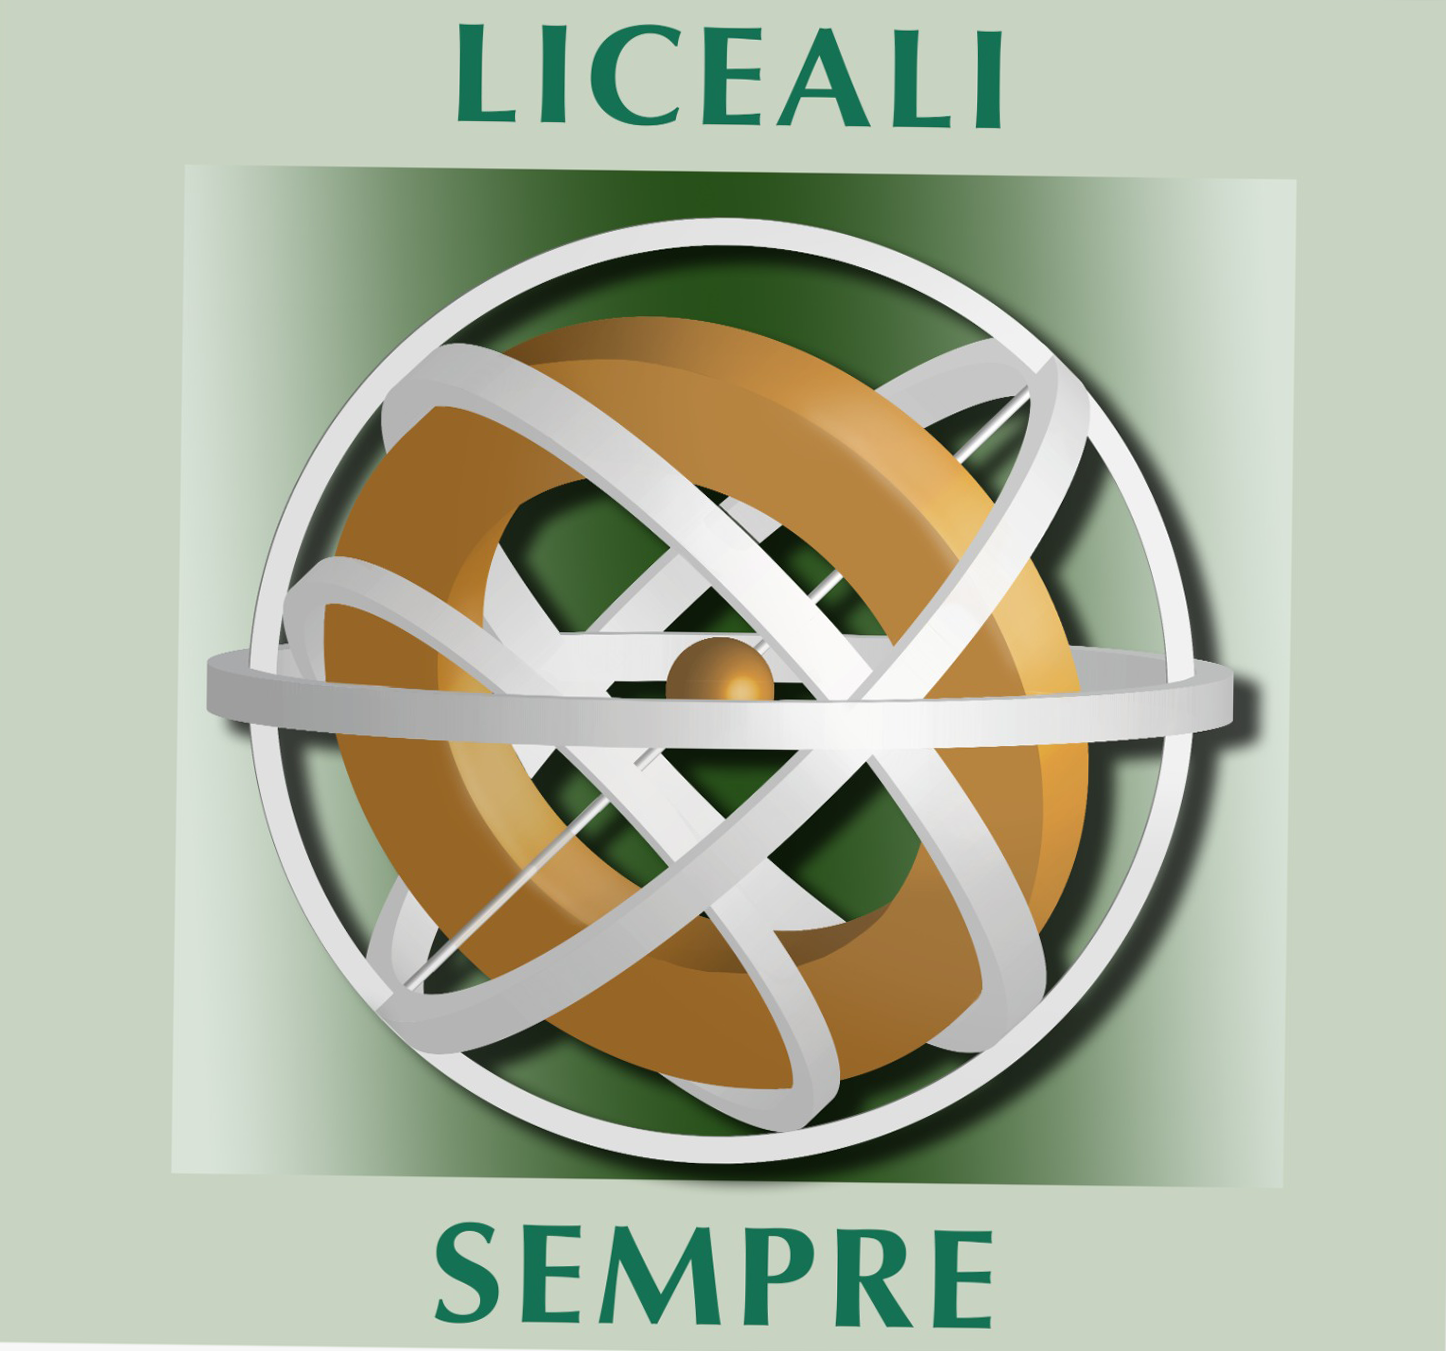 liceali logo